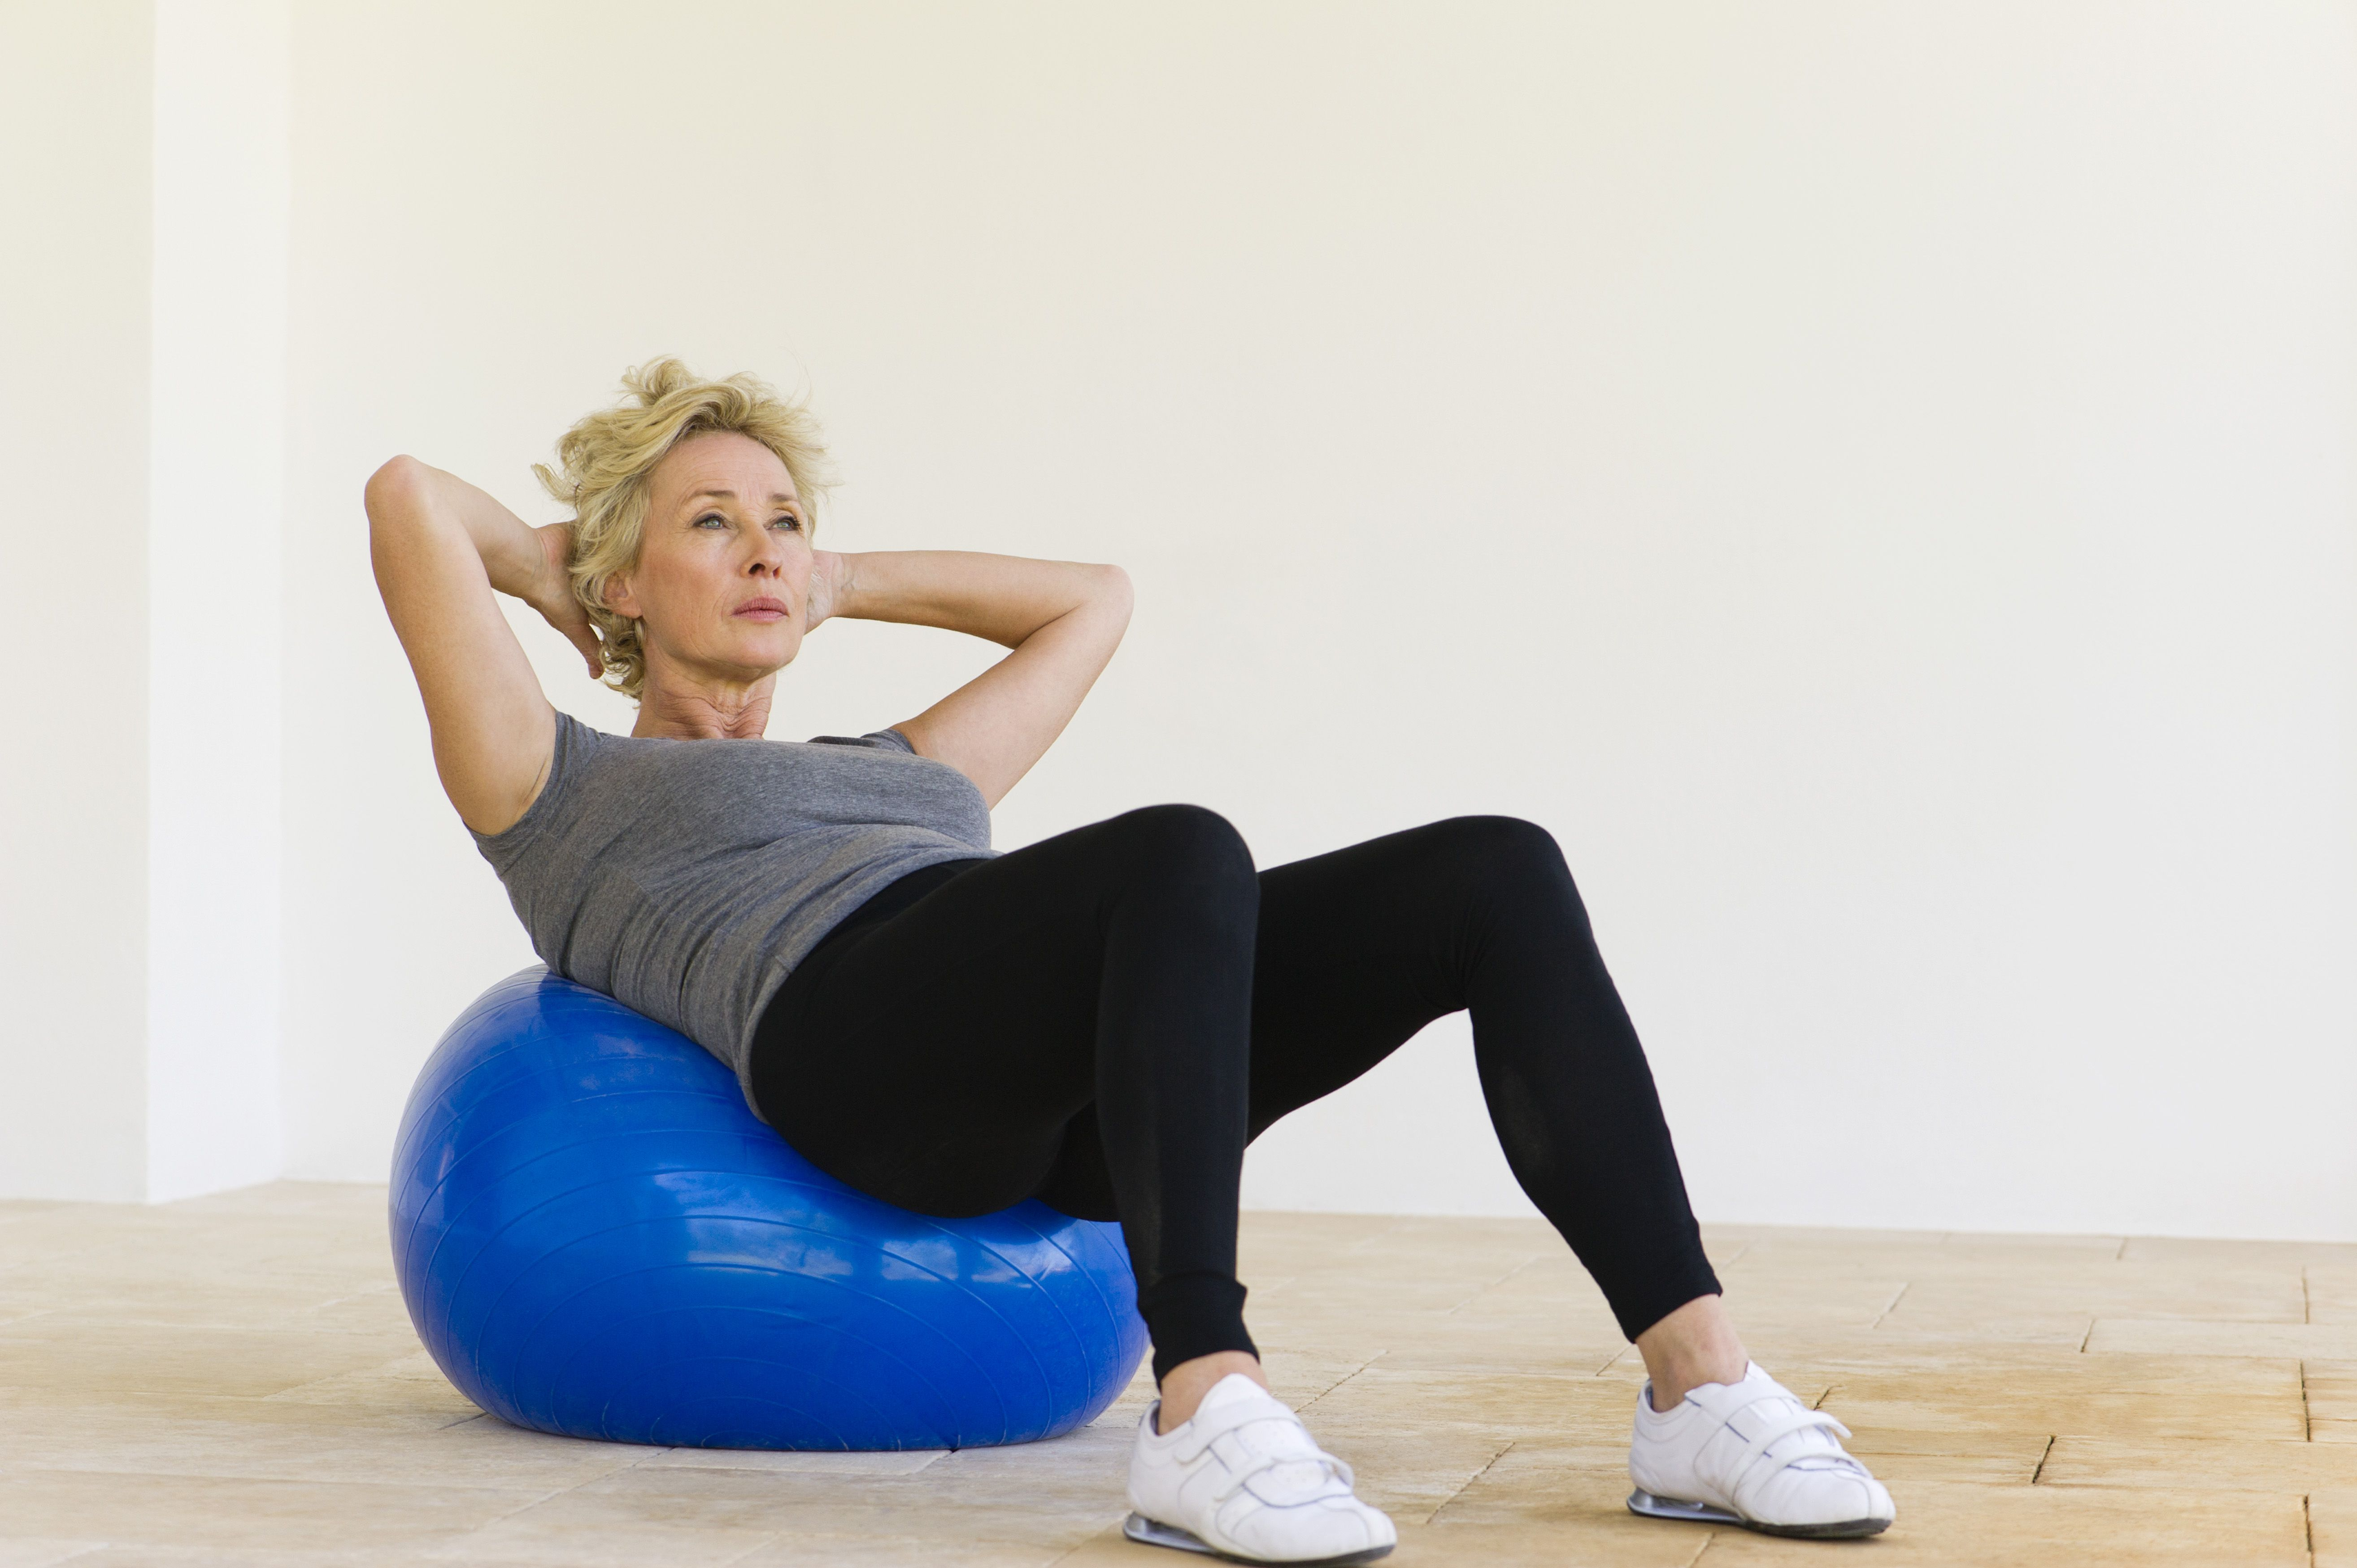 Mature woman doing sit-ups on fitness ball